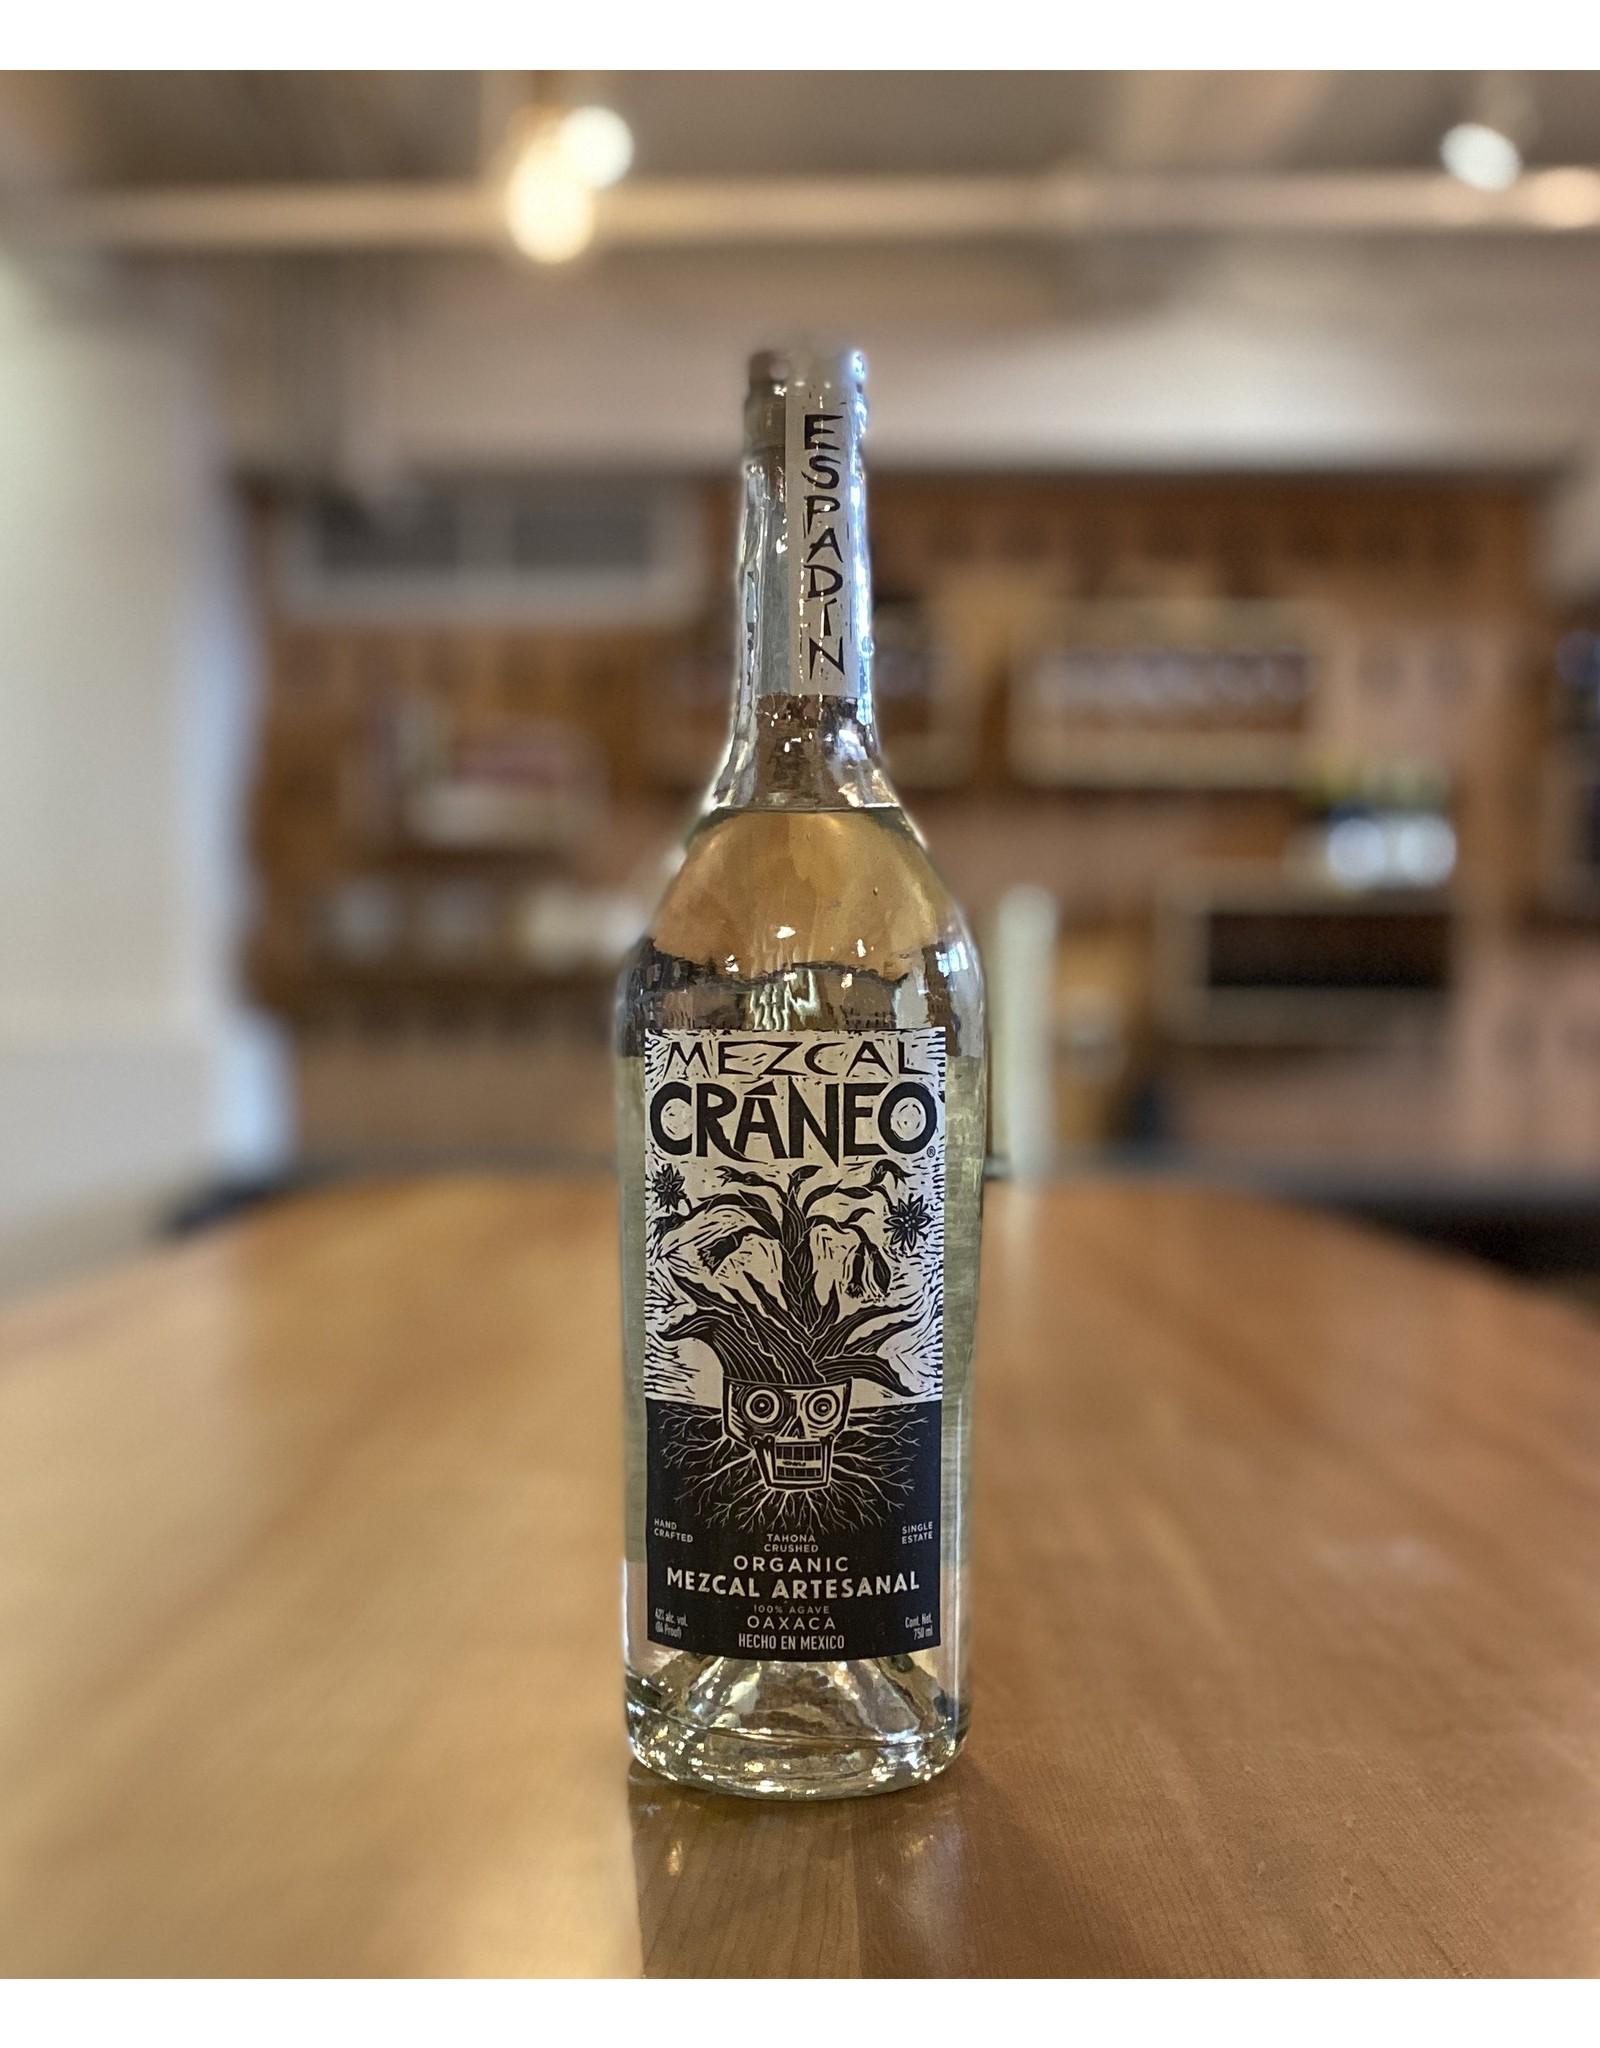 Craneo Organic Mezcal - Oaxaca, Mexico